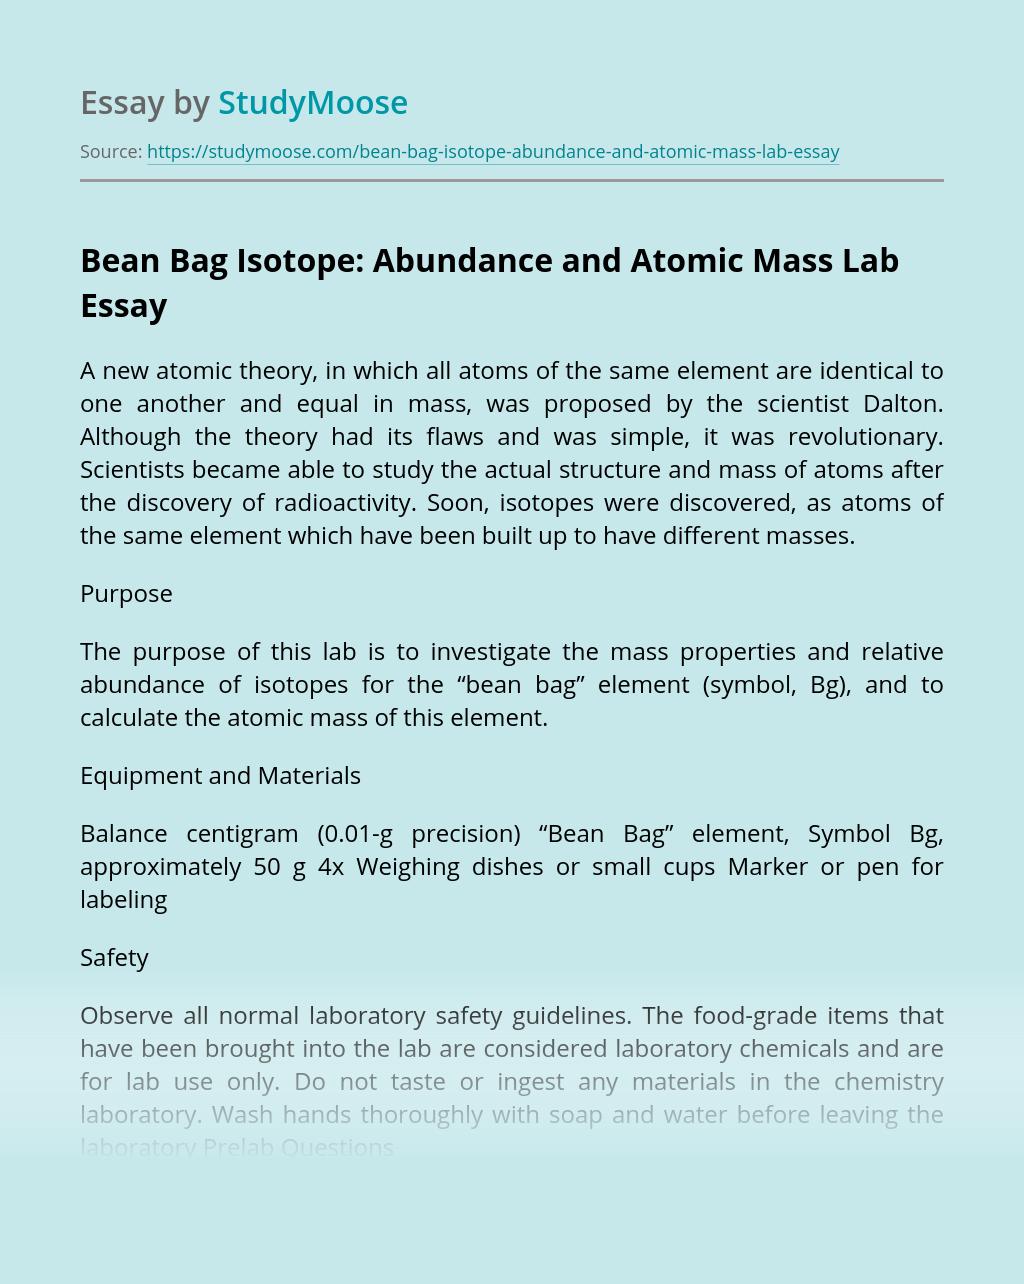 Bean Bag Isotope: Abundance and Atomic Mass Lab